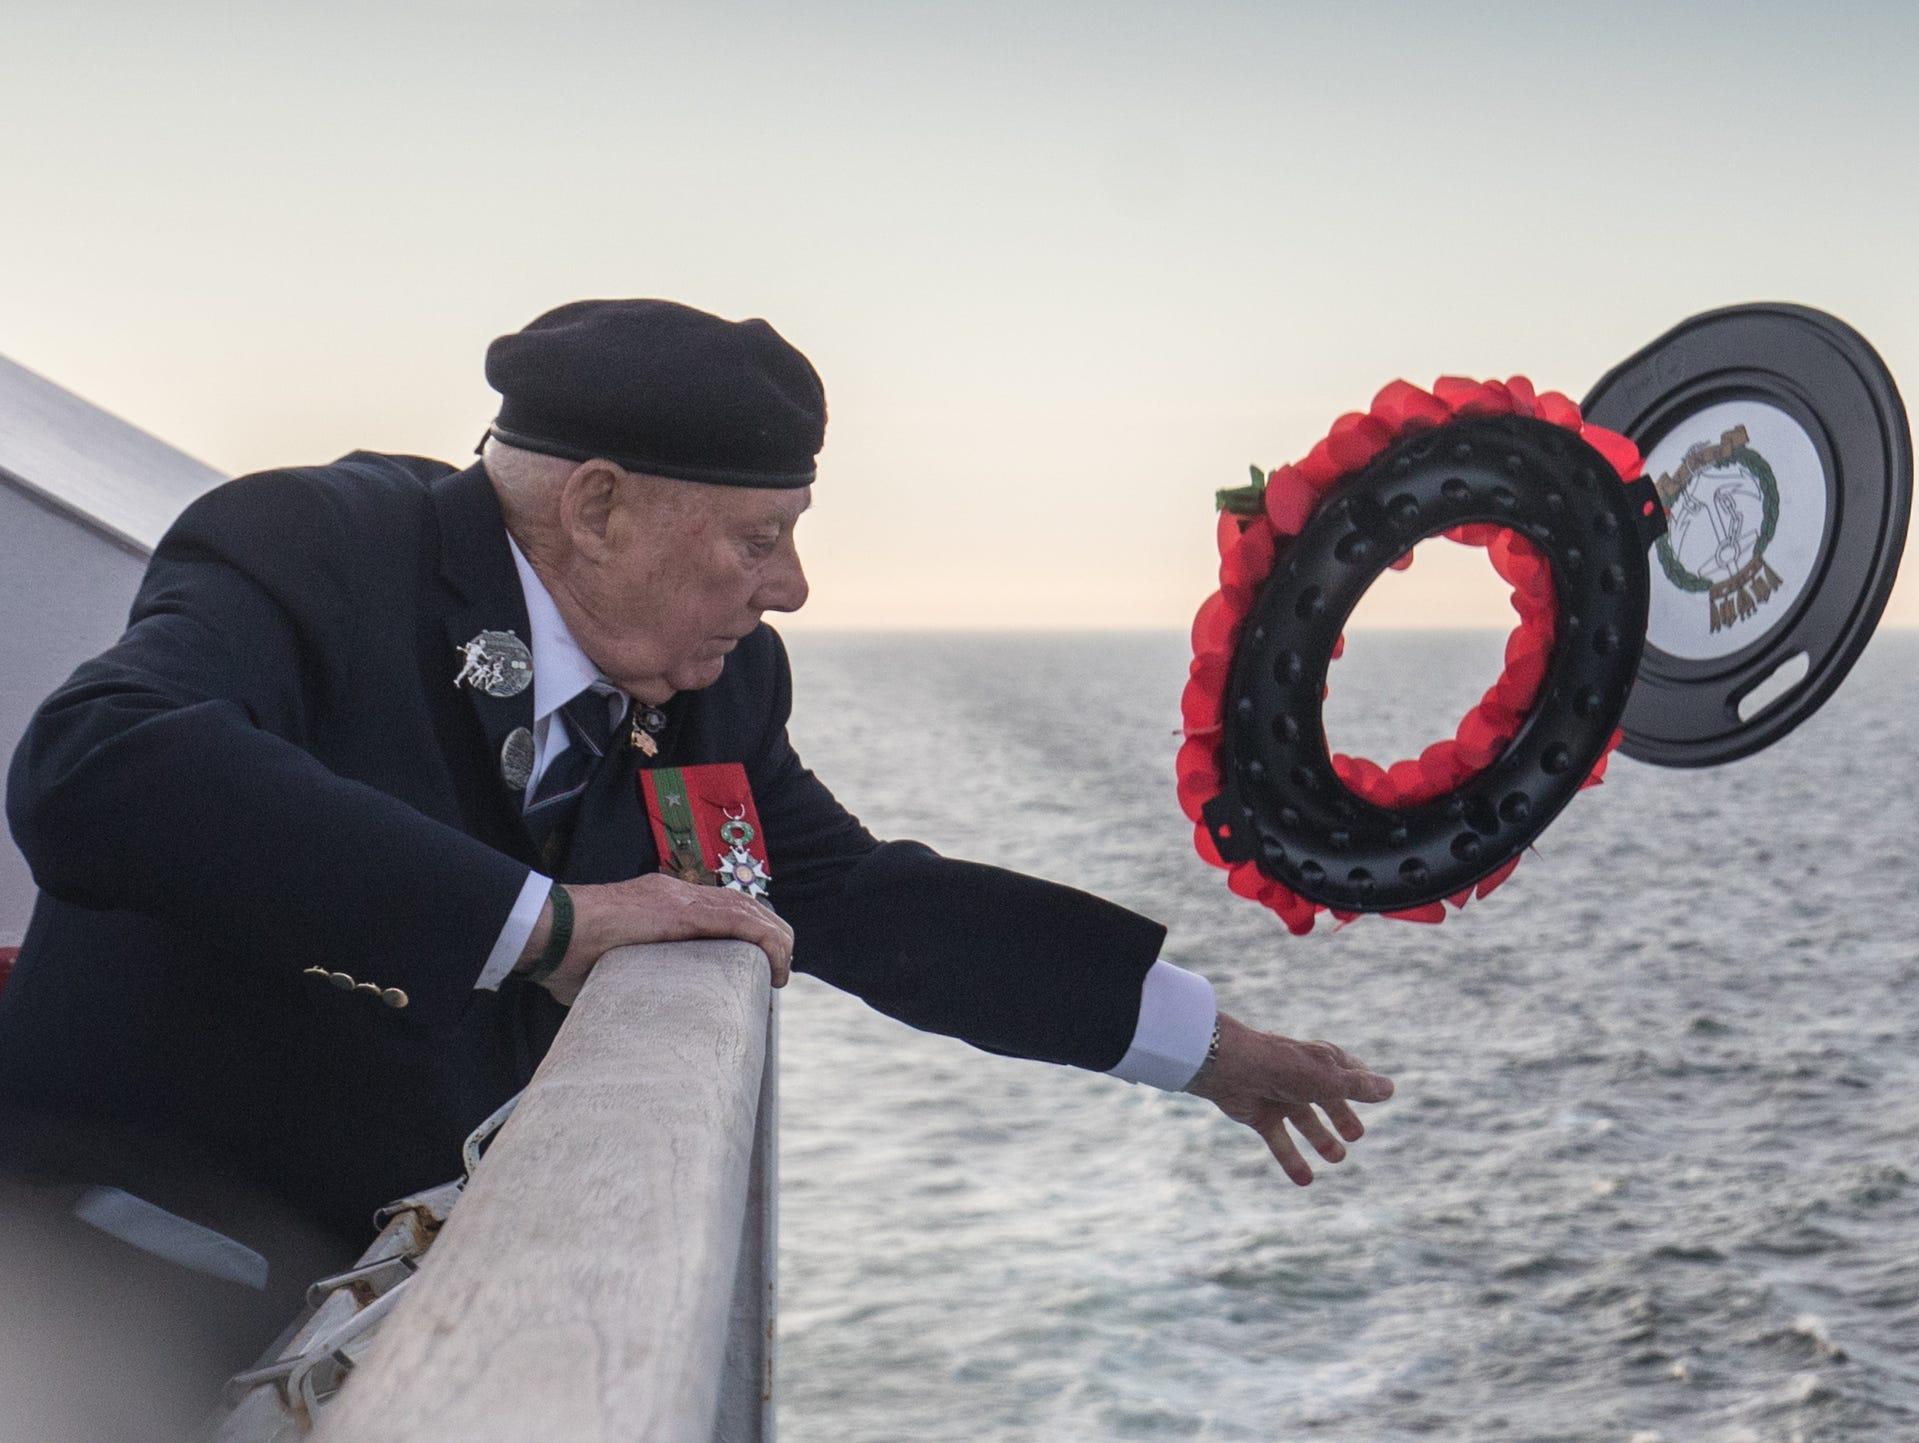 John Quinn who was a Royal Marine coxswain on a landing